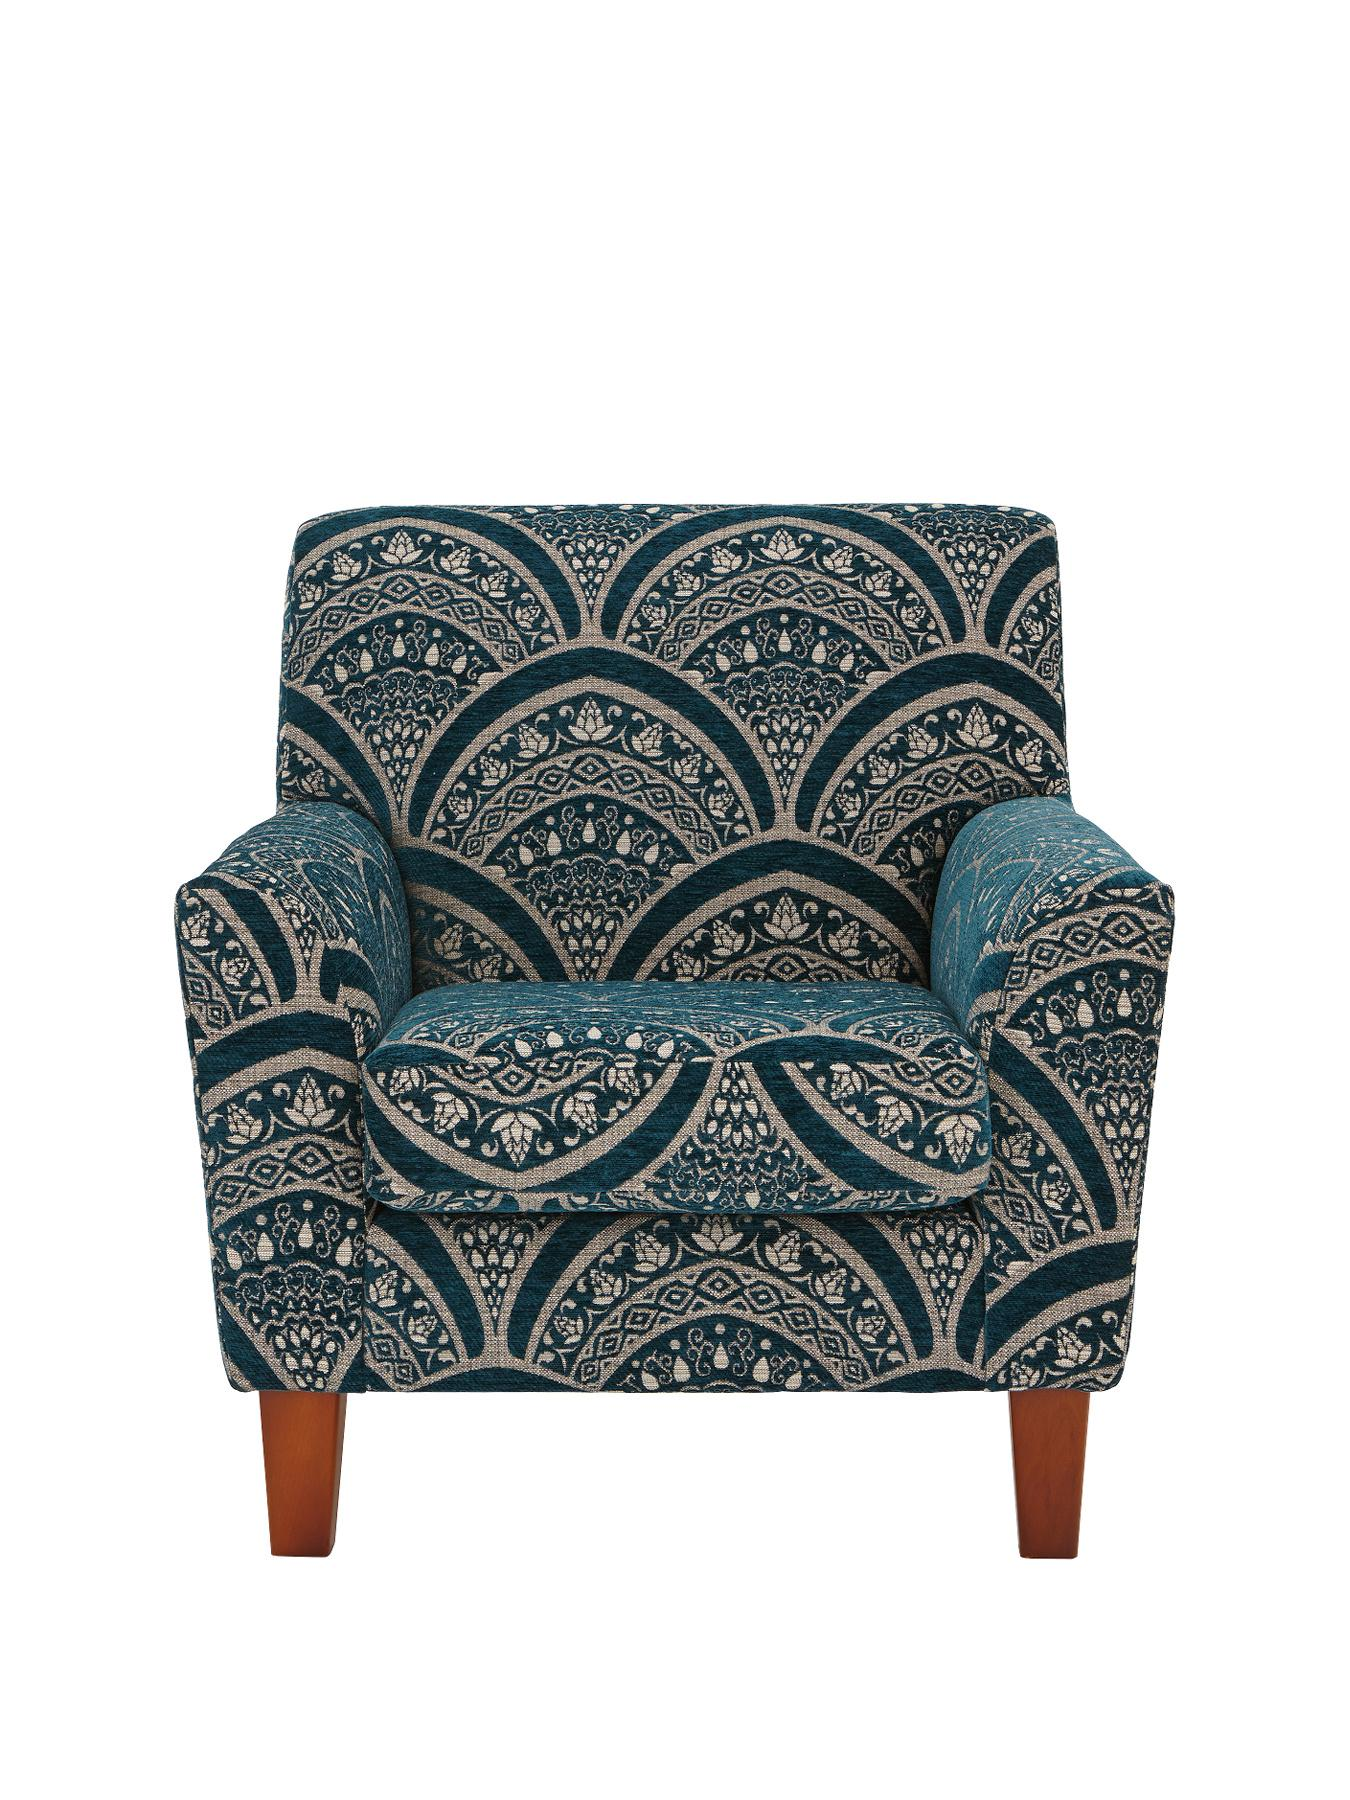 Gatsby Accent Chair, Chocolate,Grey,Black